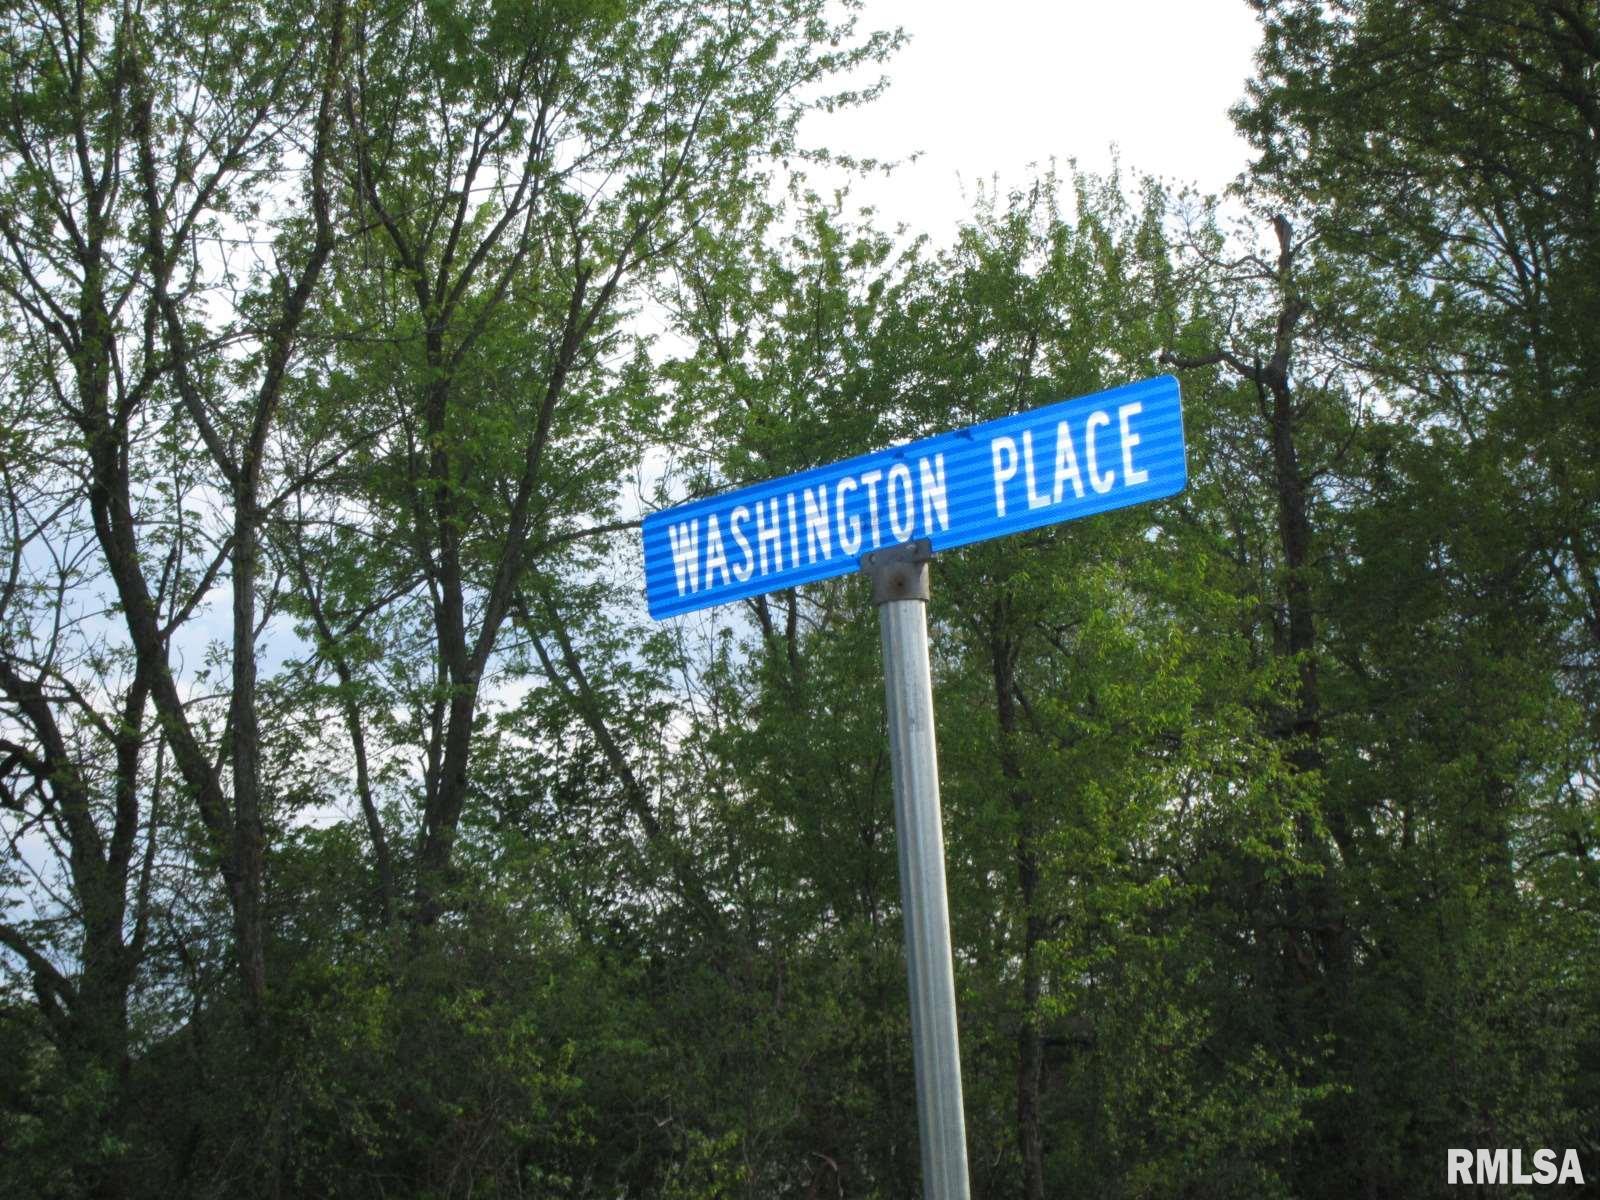 208 WASHINGTON Property Photo - Riverton, IL real estate listing